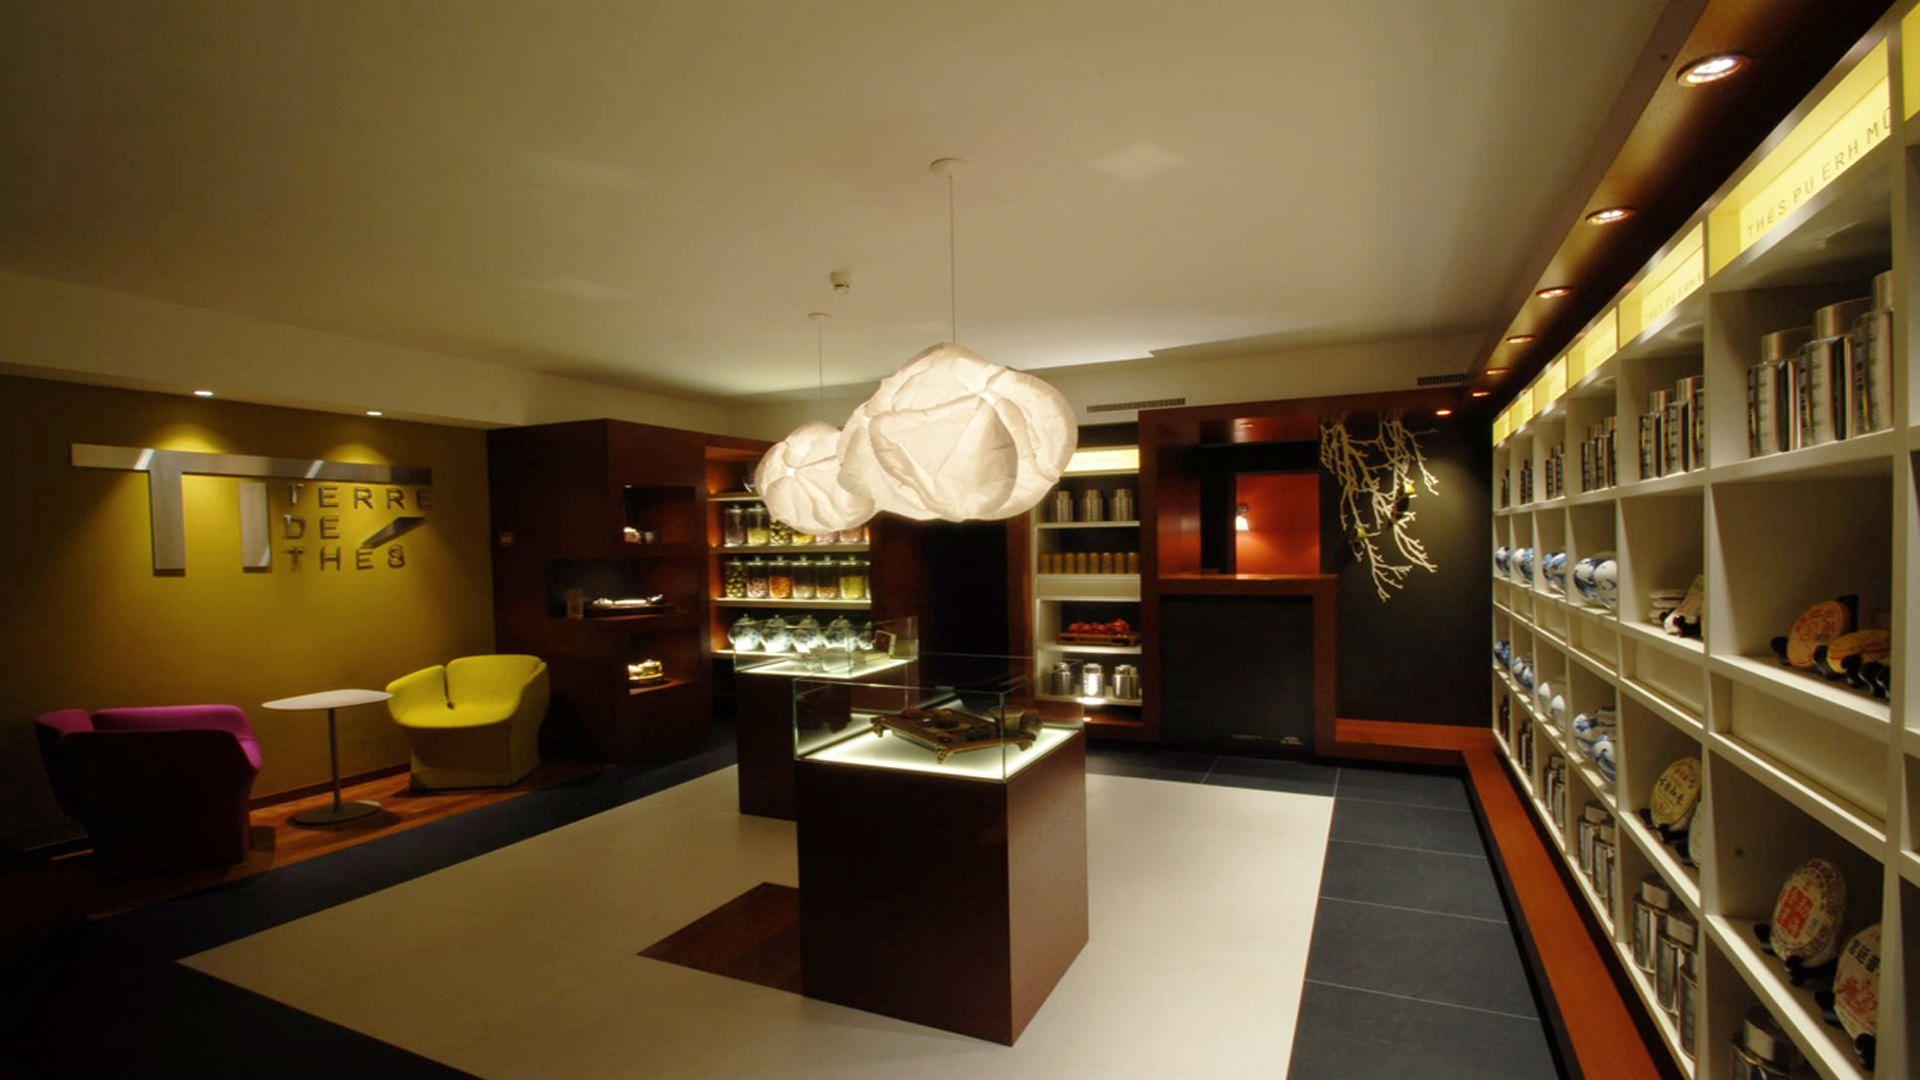 Swiss bureau interior design designed terre de thes lausanne